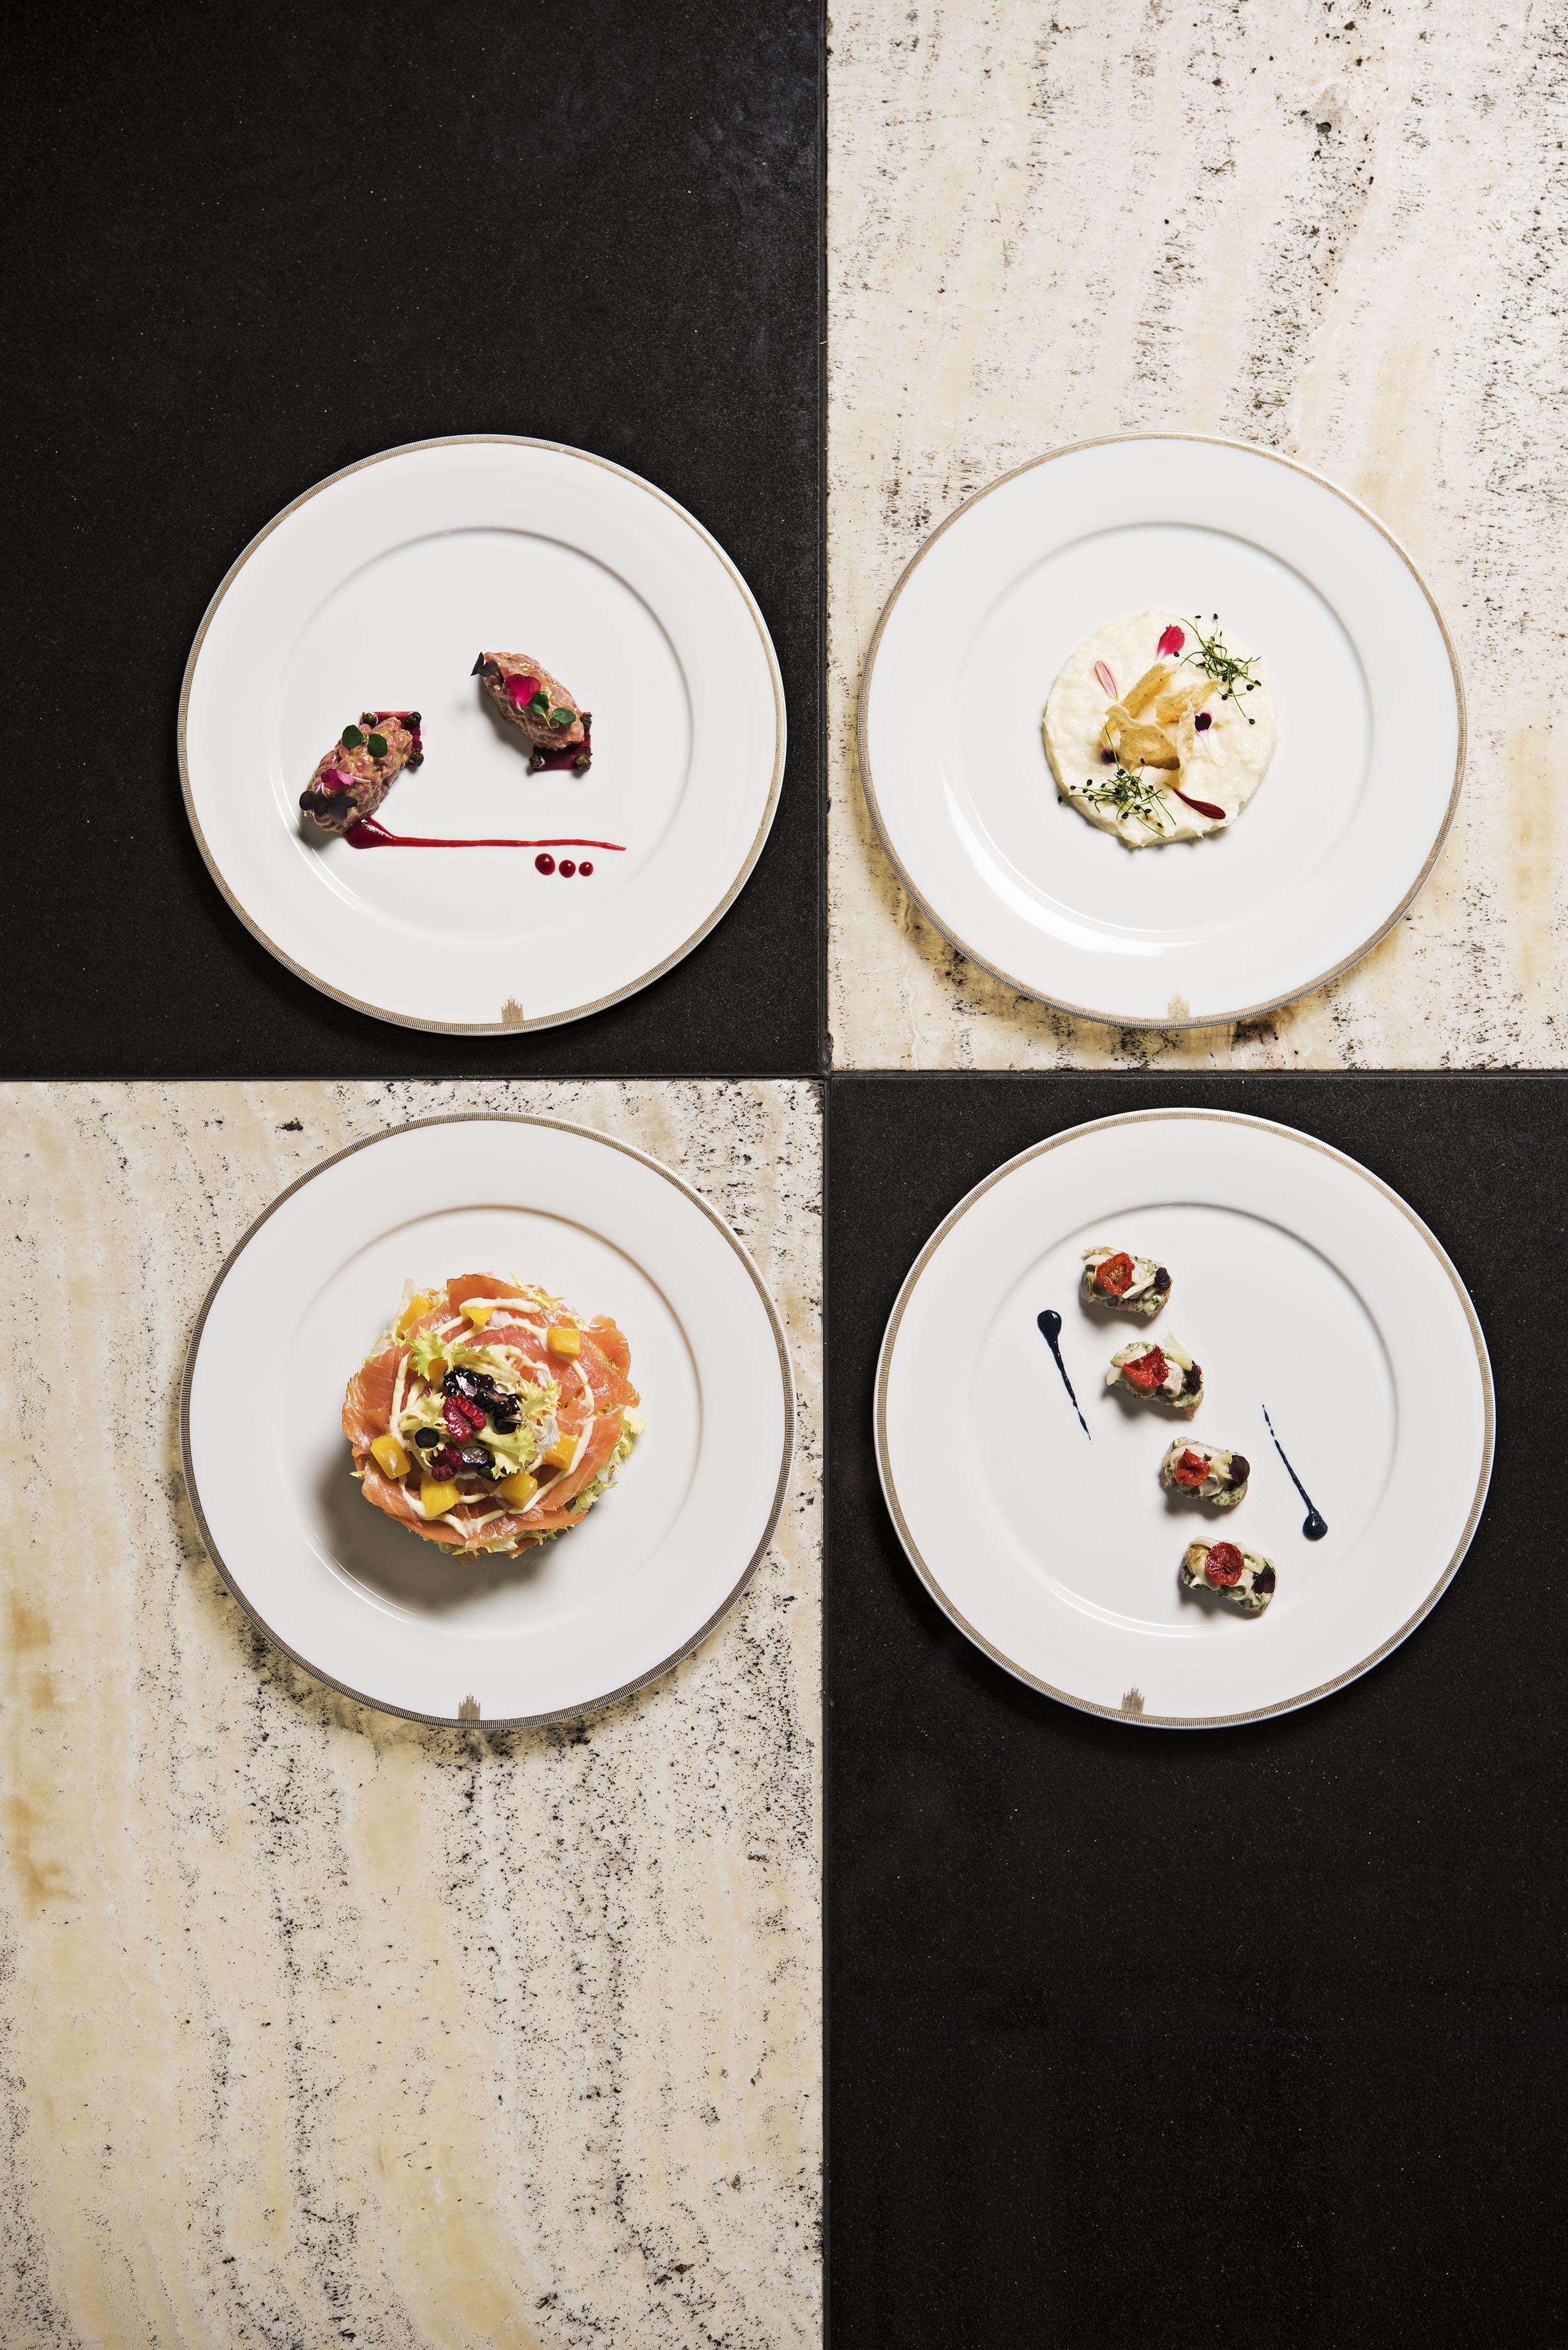 Meet the Chefs: Filippo Gozzoli / José Avillez.